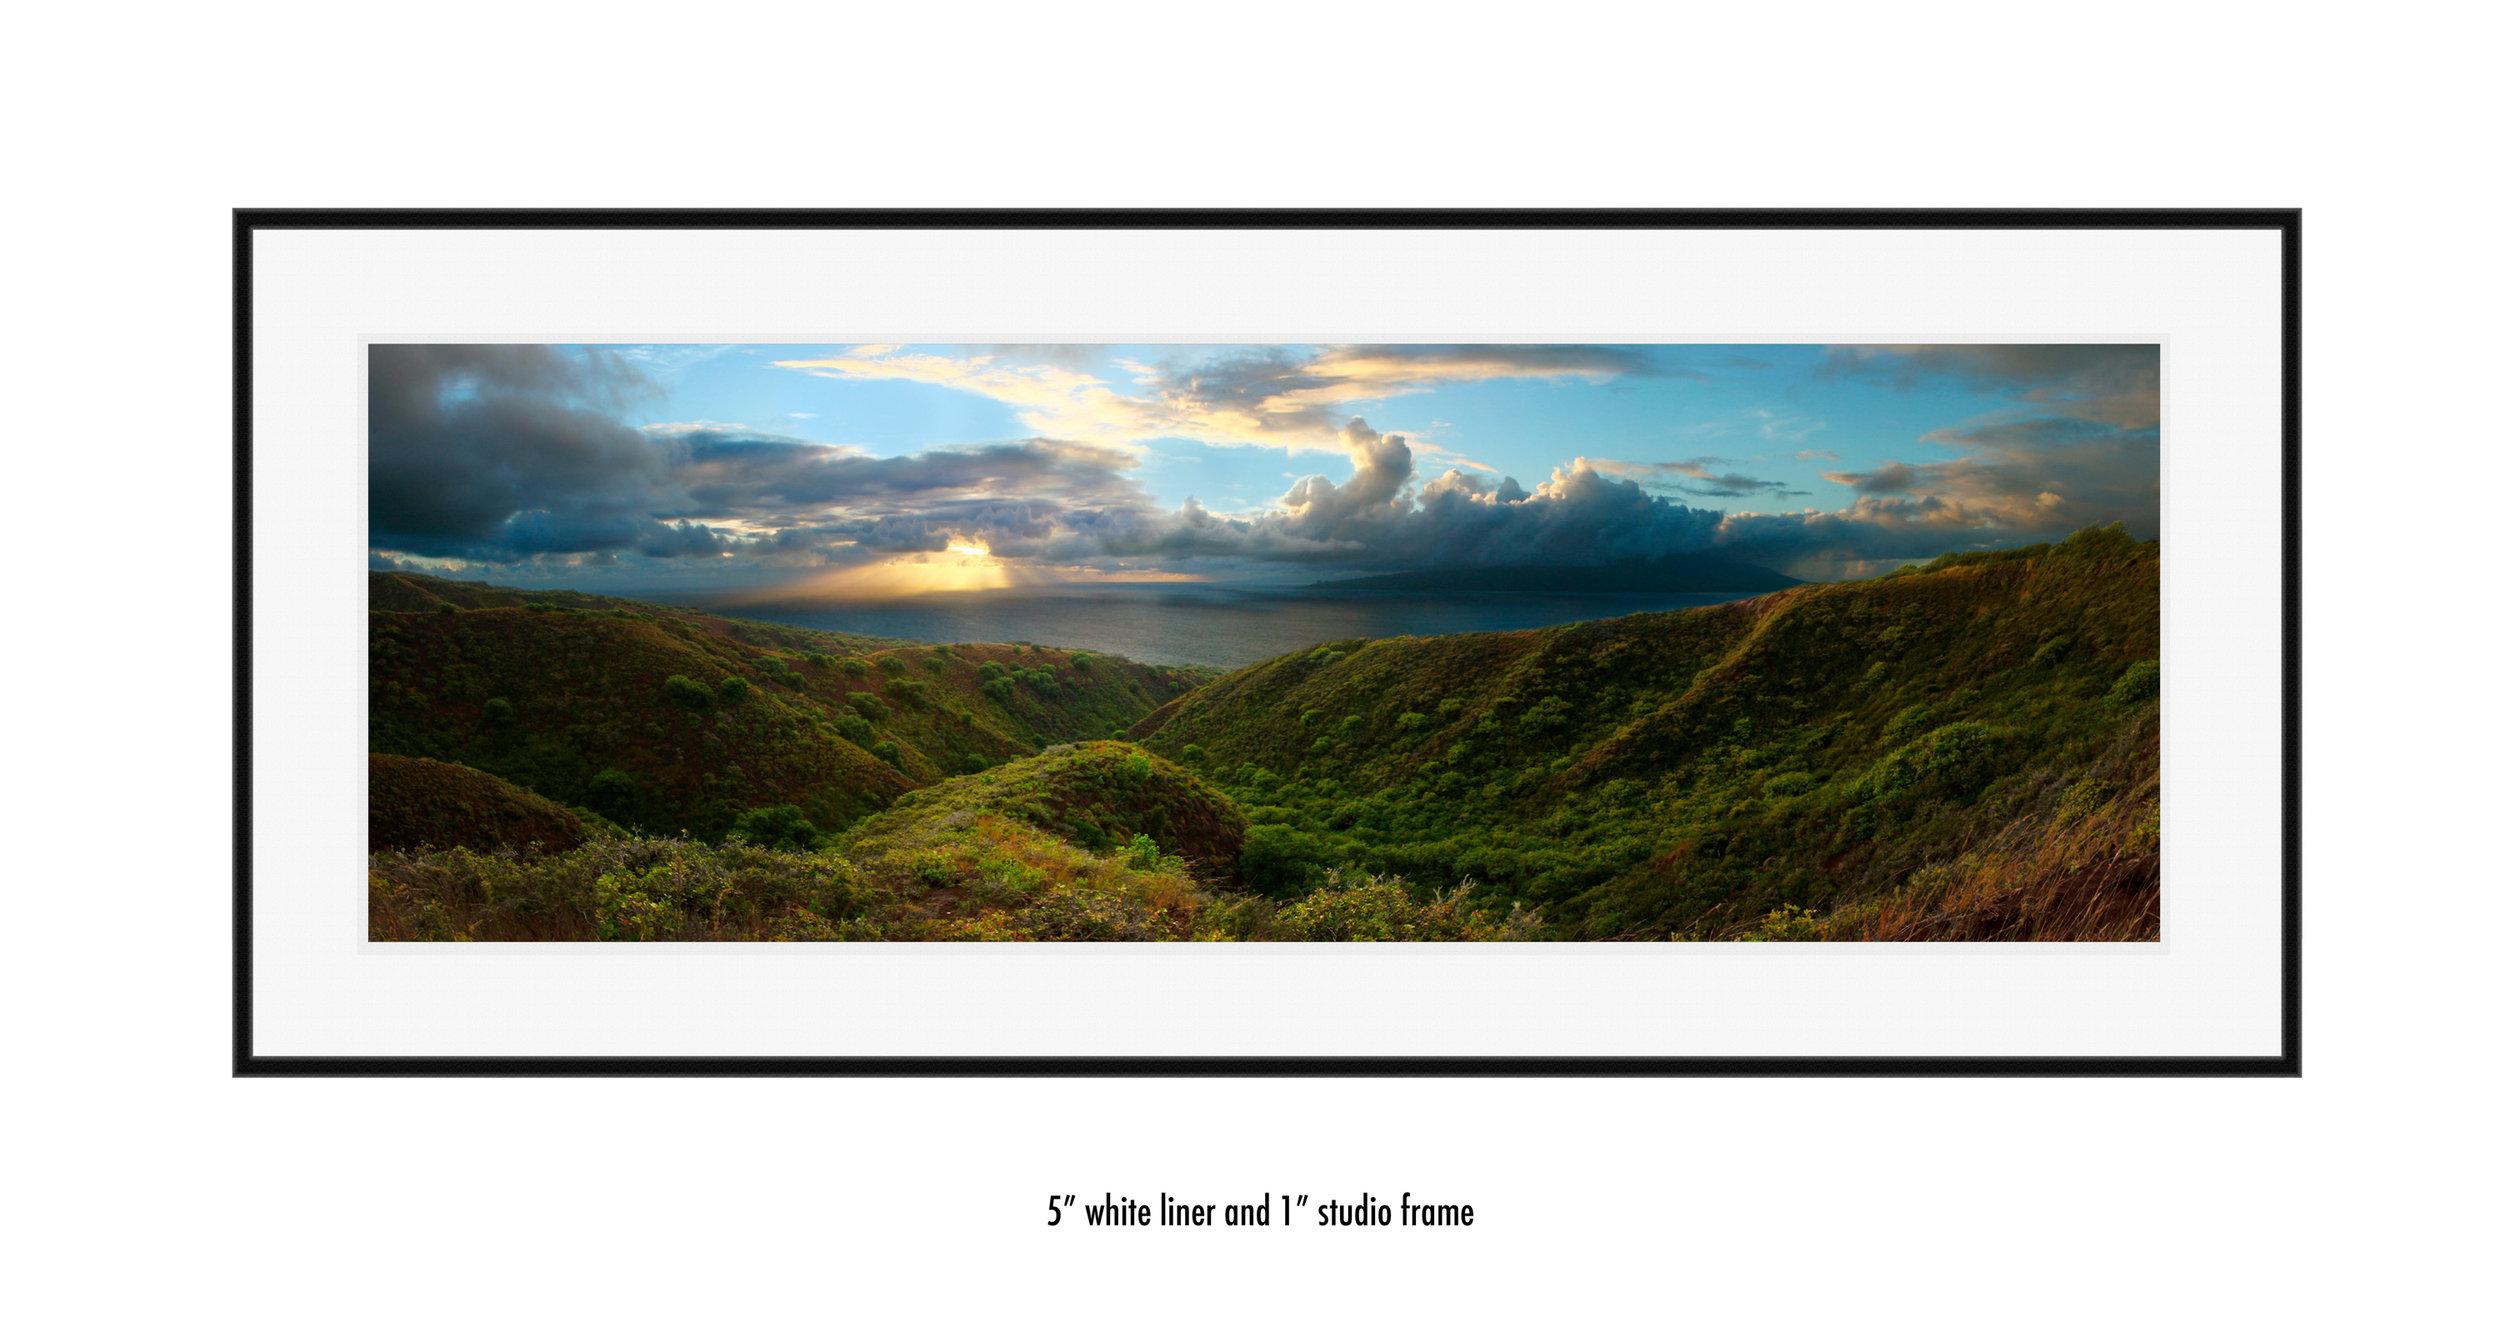 Molokai-Panorama-5-in-wht-liner-blk-frame.jpg